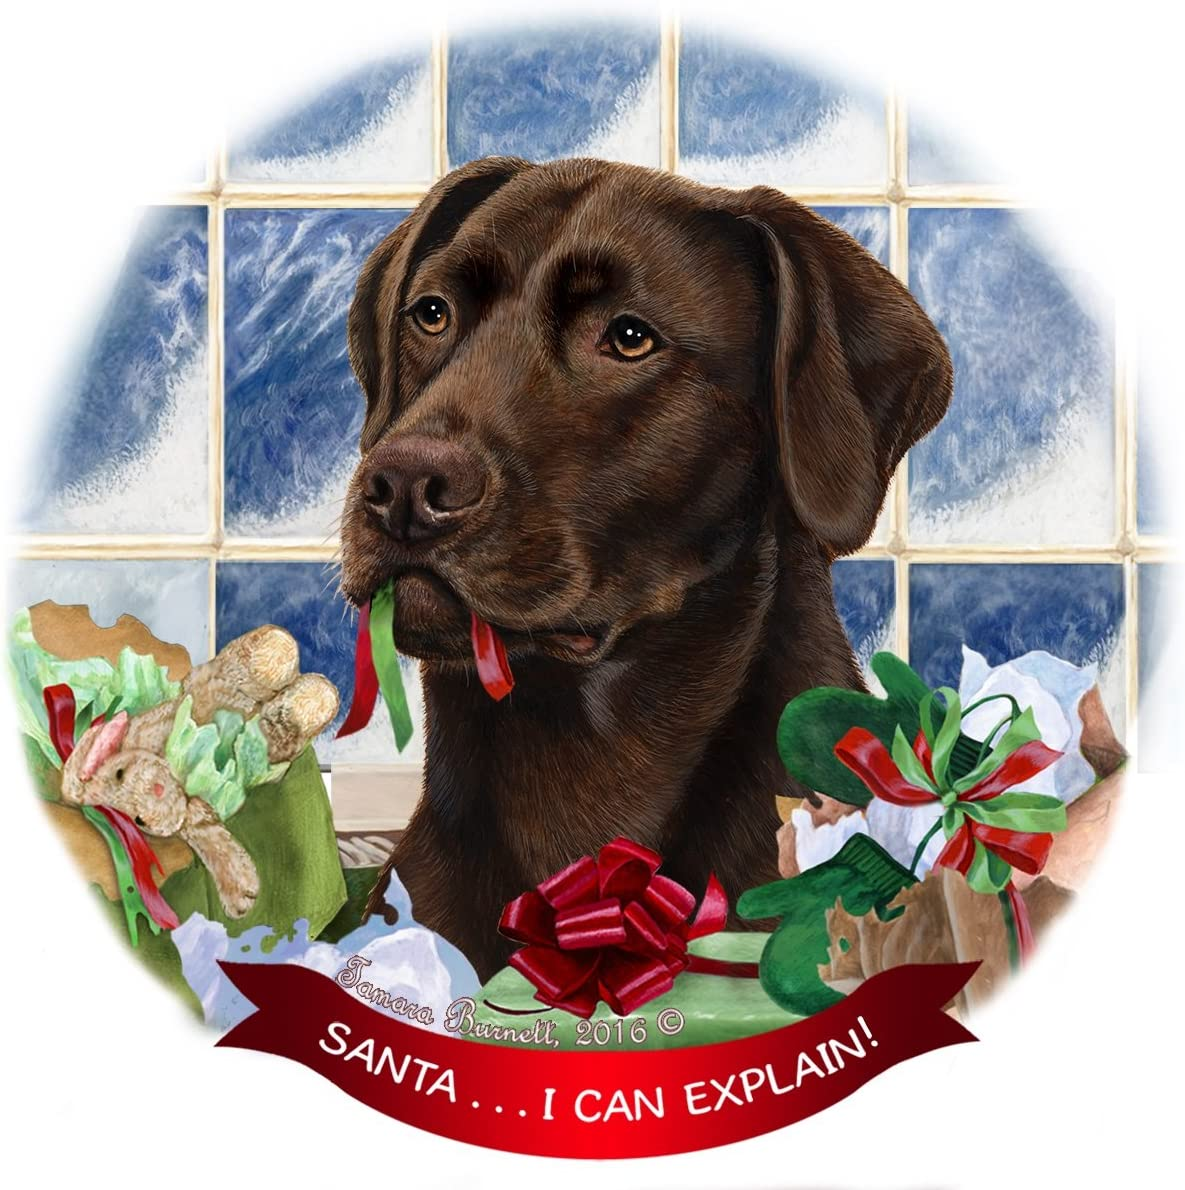 Chocolate Labrador Lab 5 ☆ popular Dog Porcelain Gift 'Santa.. Japan Maker New Ornament Pet